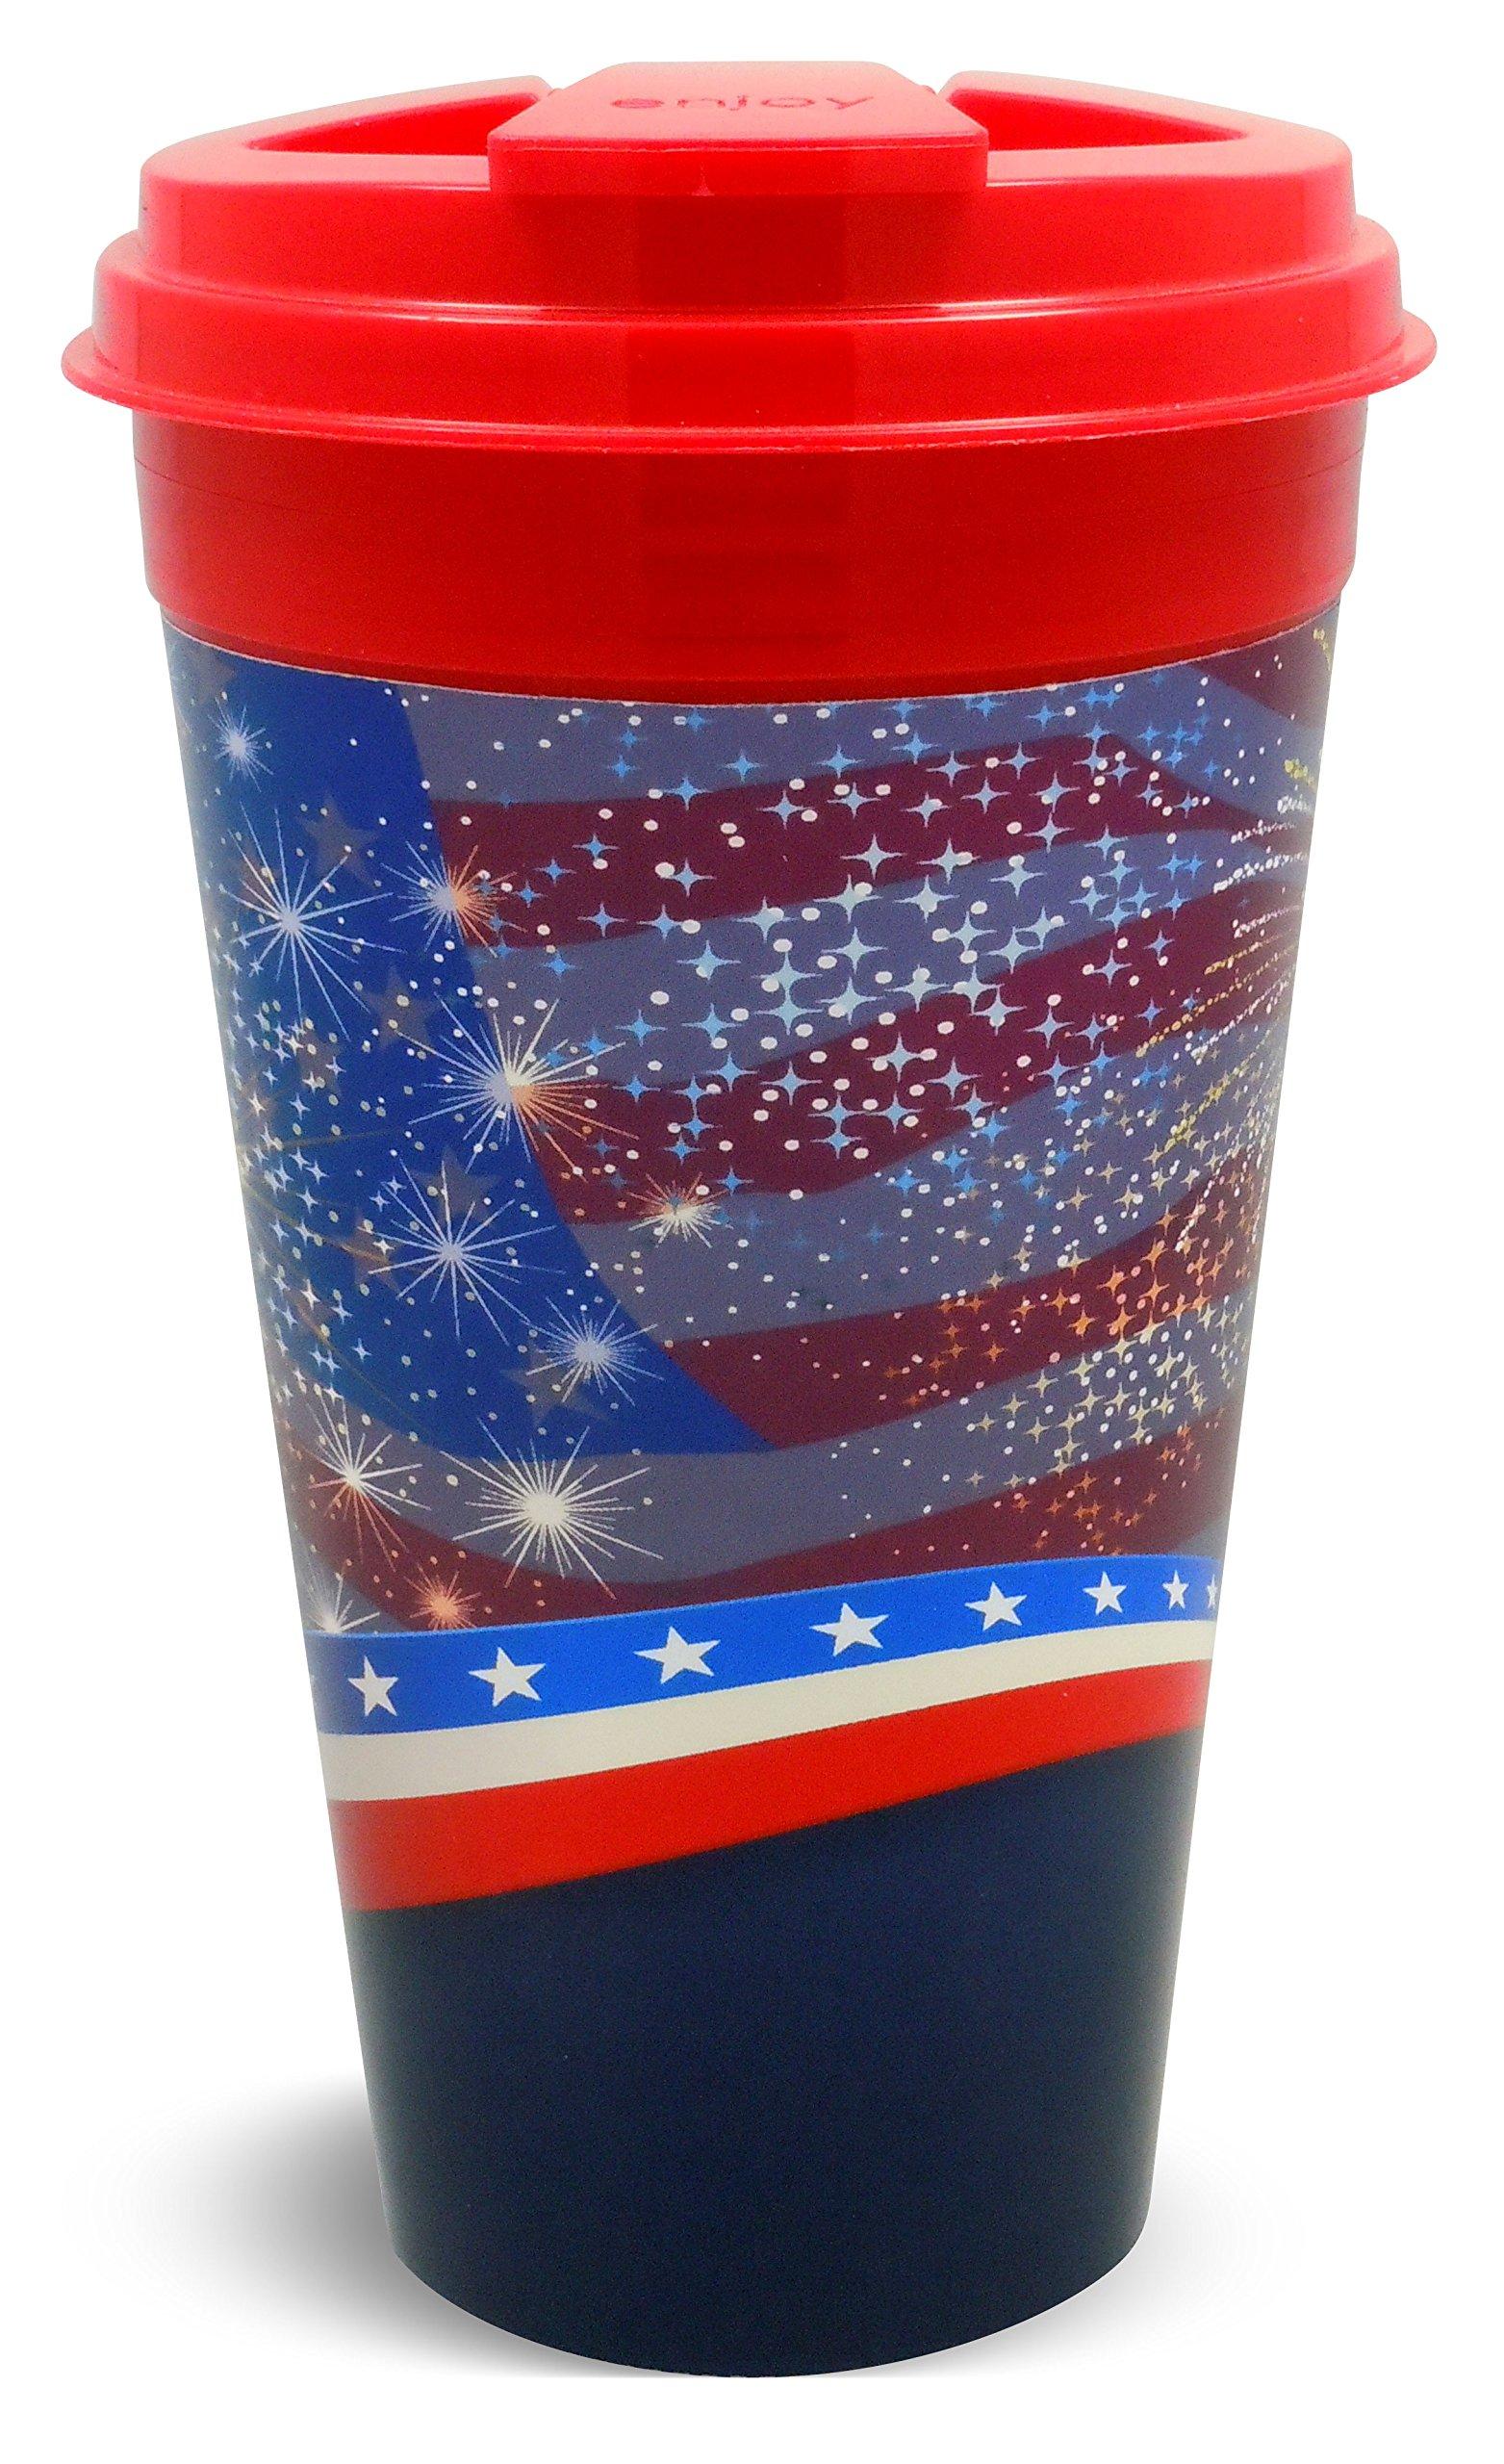 Easy Traveler Everyday Collection/American Spirit Insulated Travel Mug, 16 Oz., Set of 2